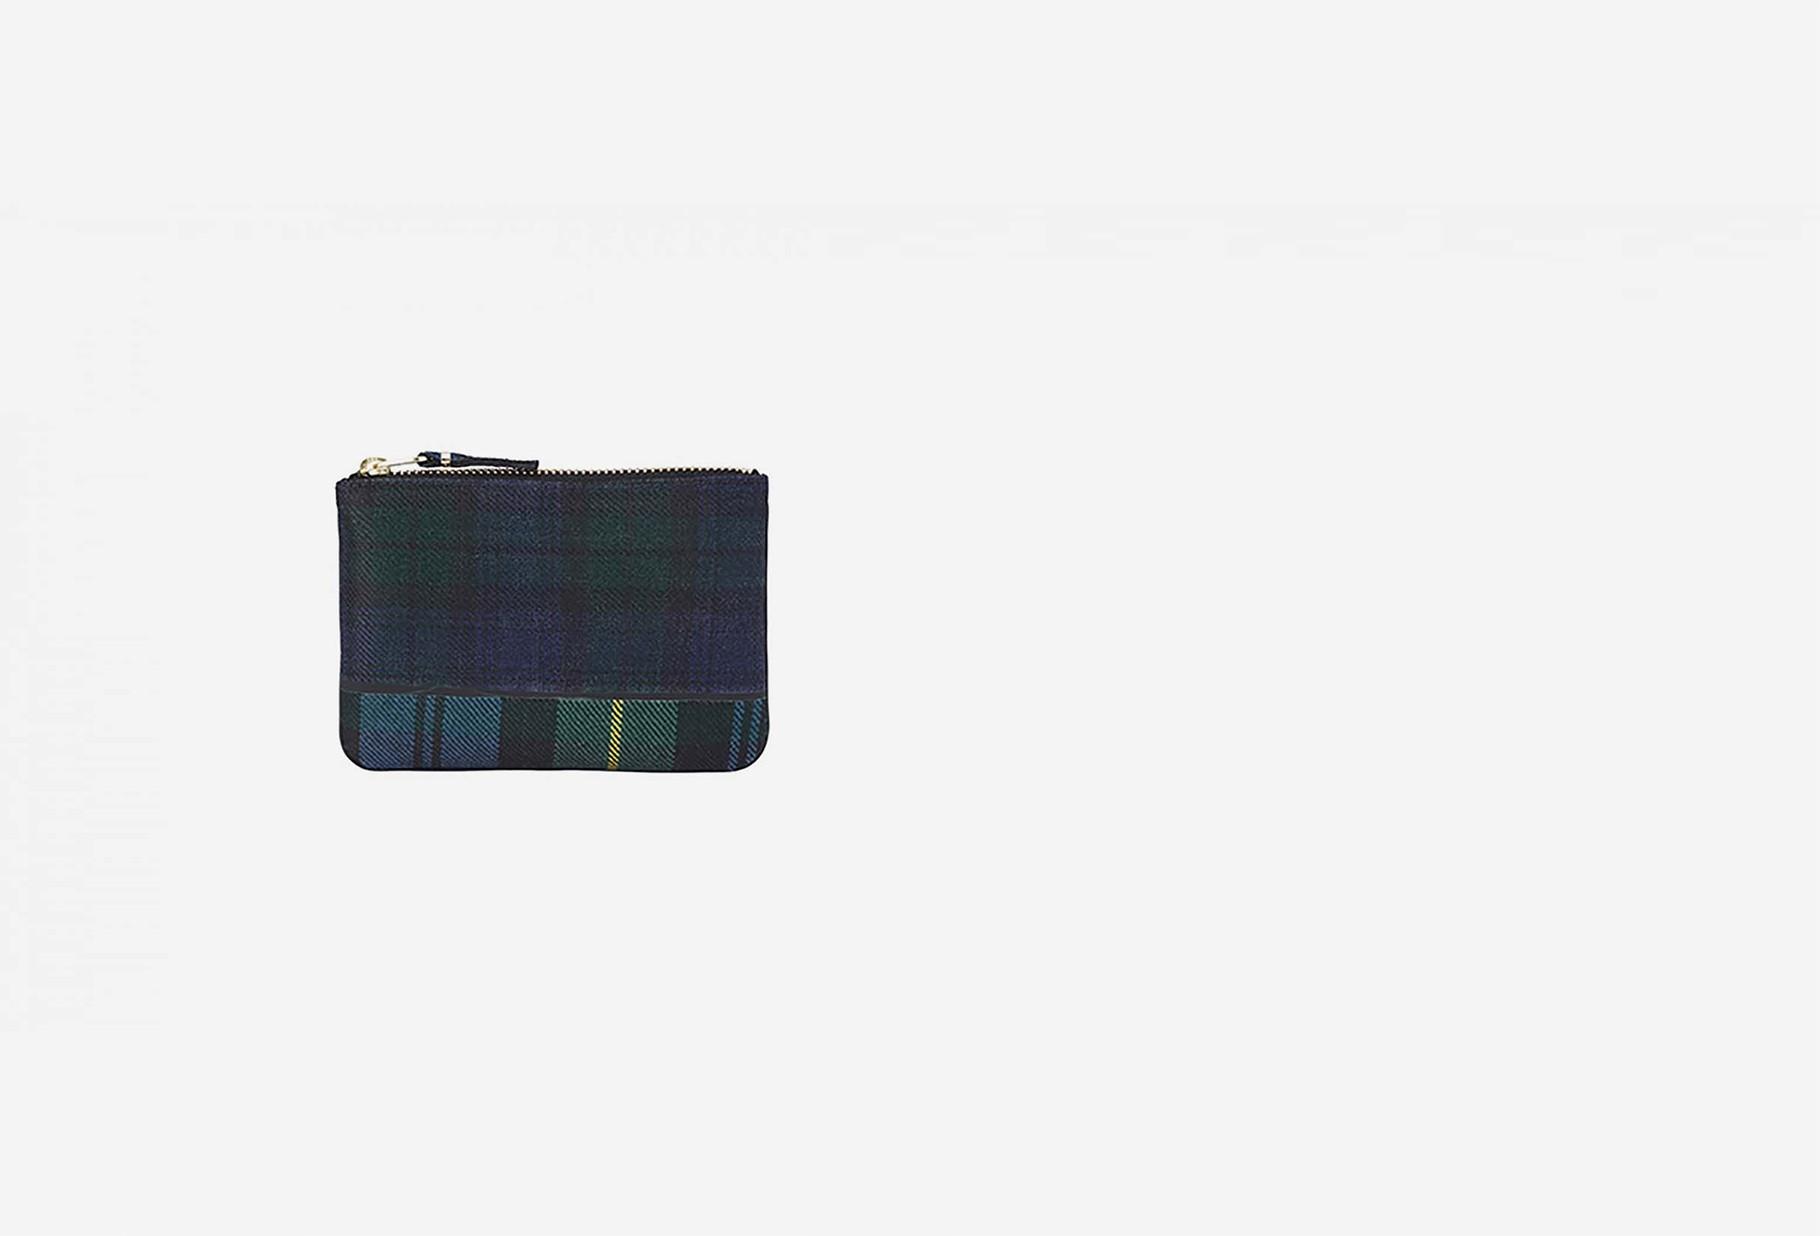 COMME DES GARÇONS WALLETS / Cdg wallet tartan patchwork Sa8100tp green